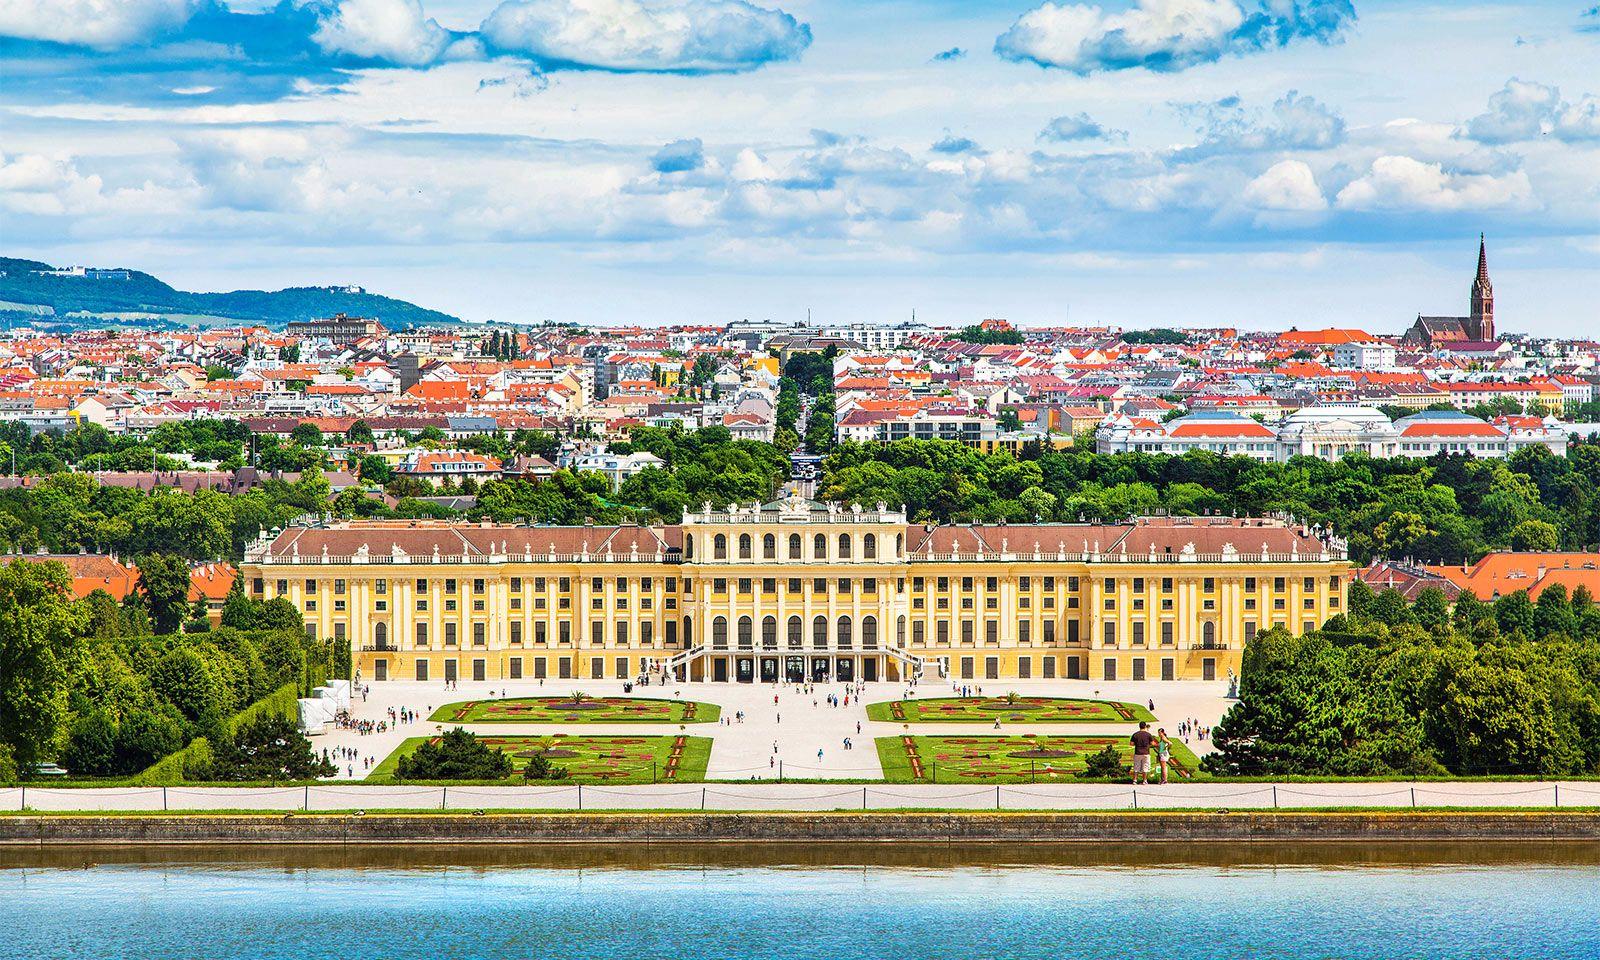 Vienna Palace